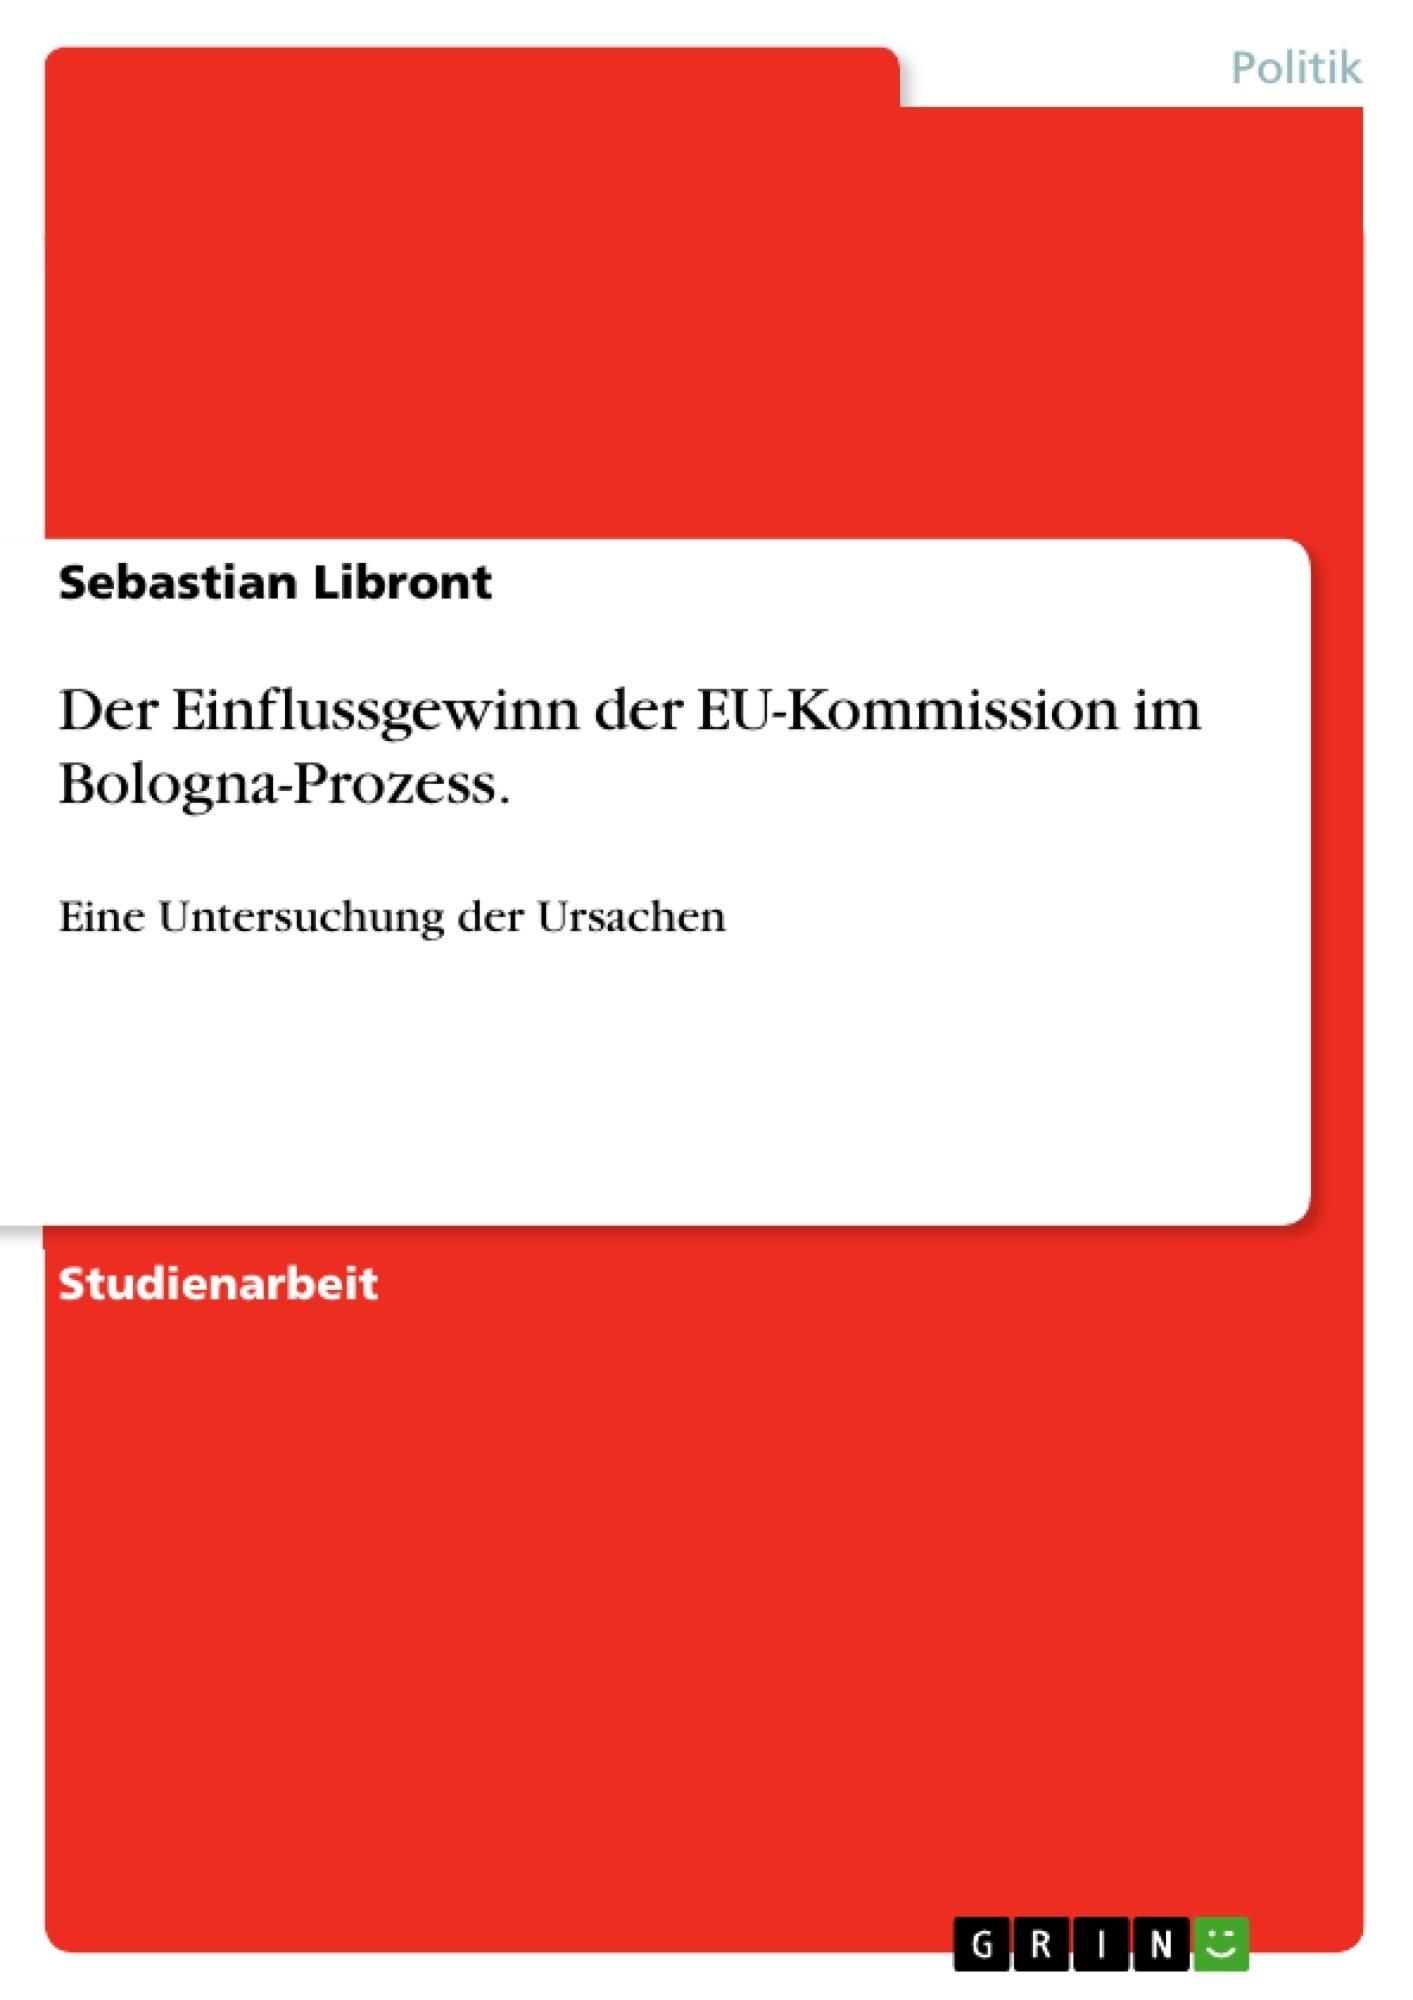 Titel: Der Einflussgewinn der EU-Kommission im Bologna-Prozess.